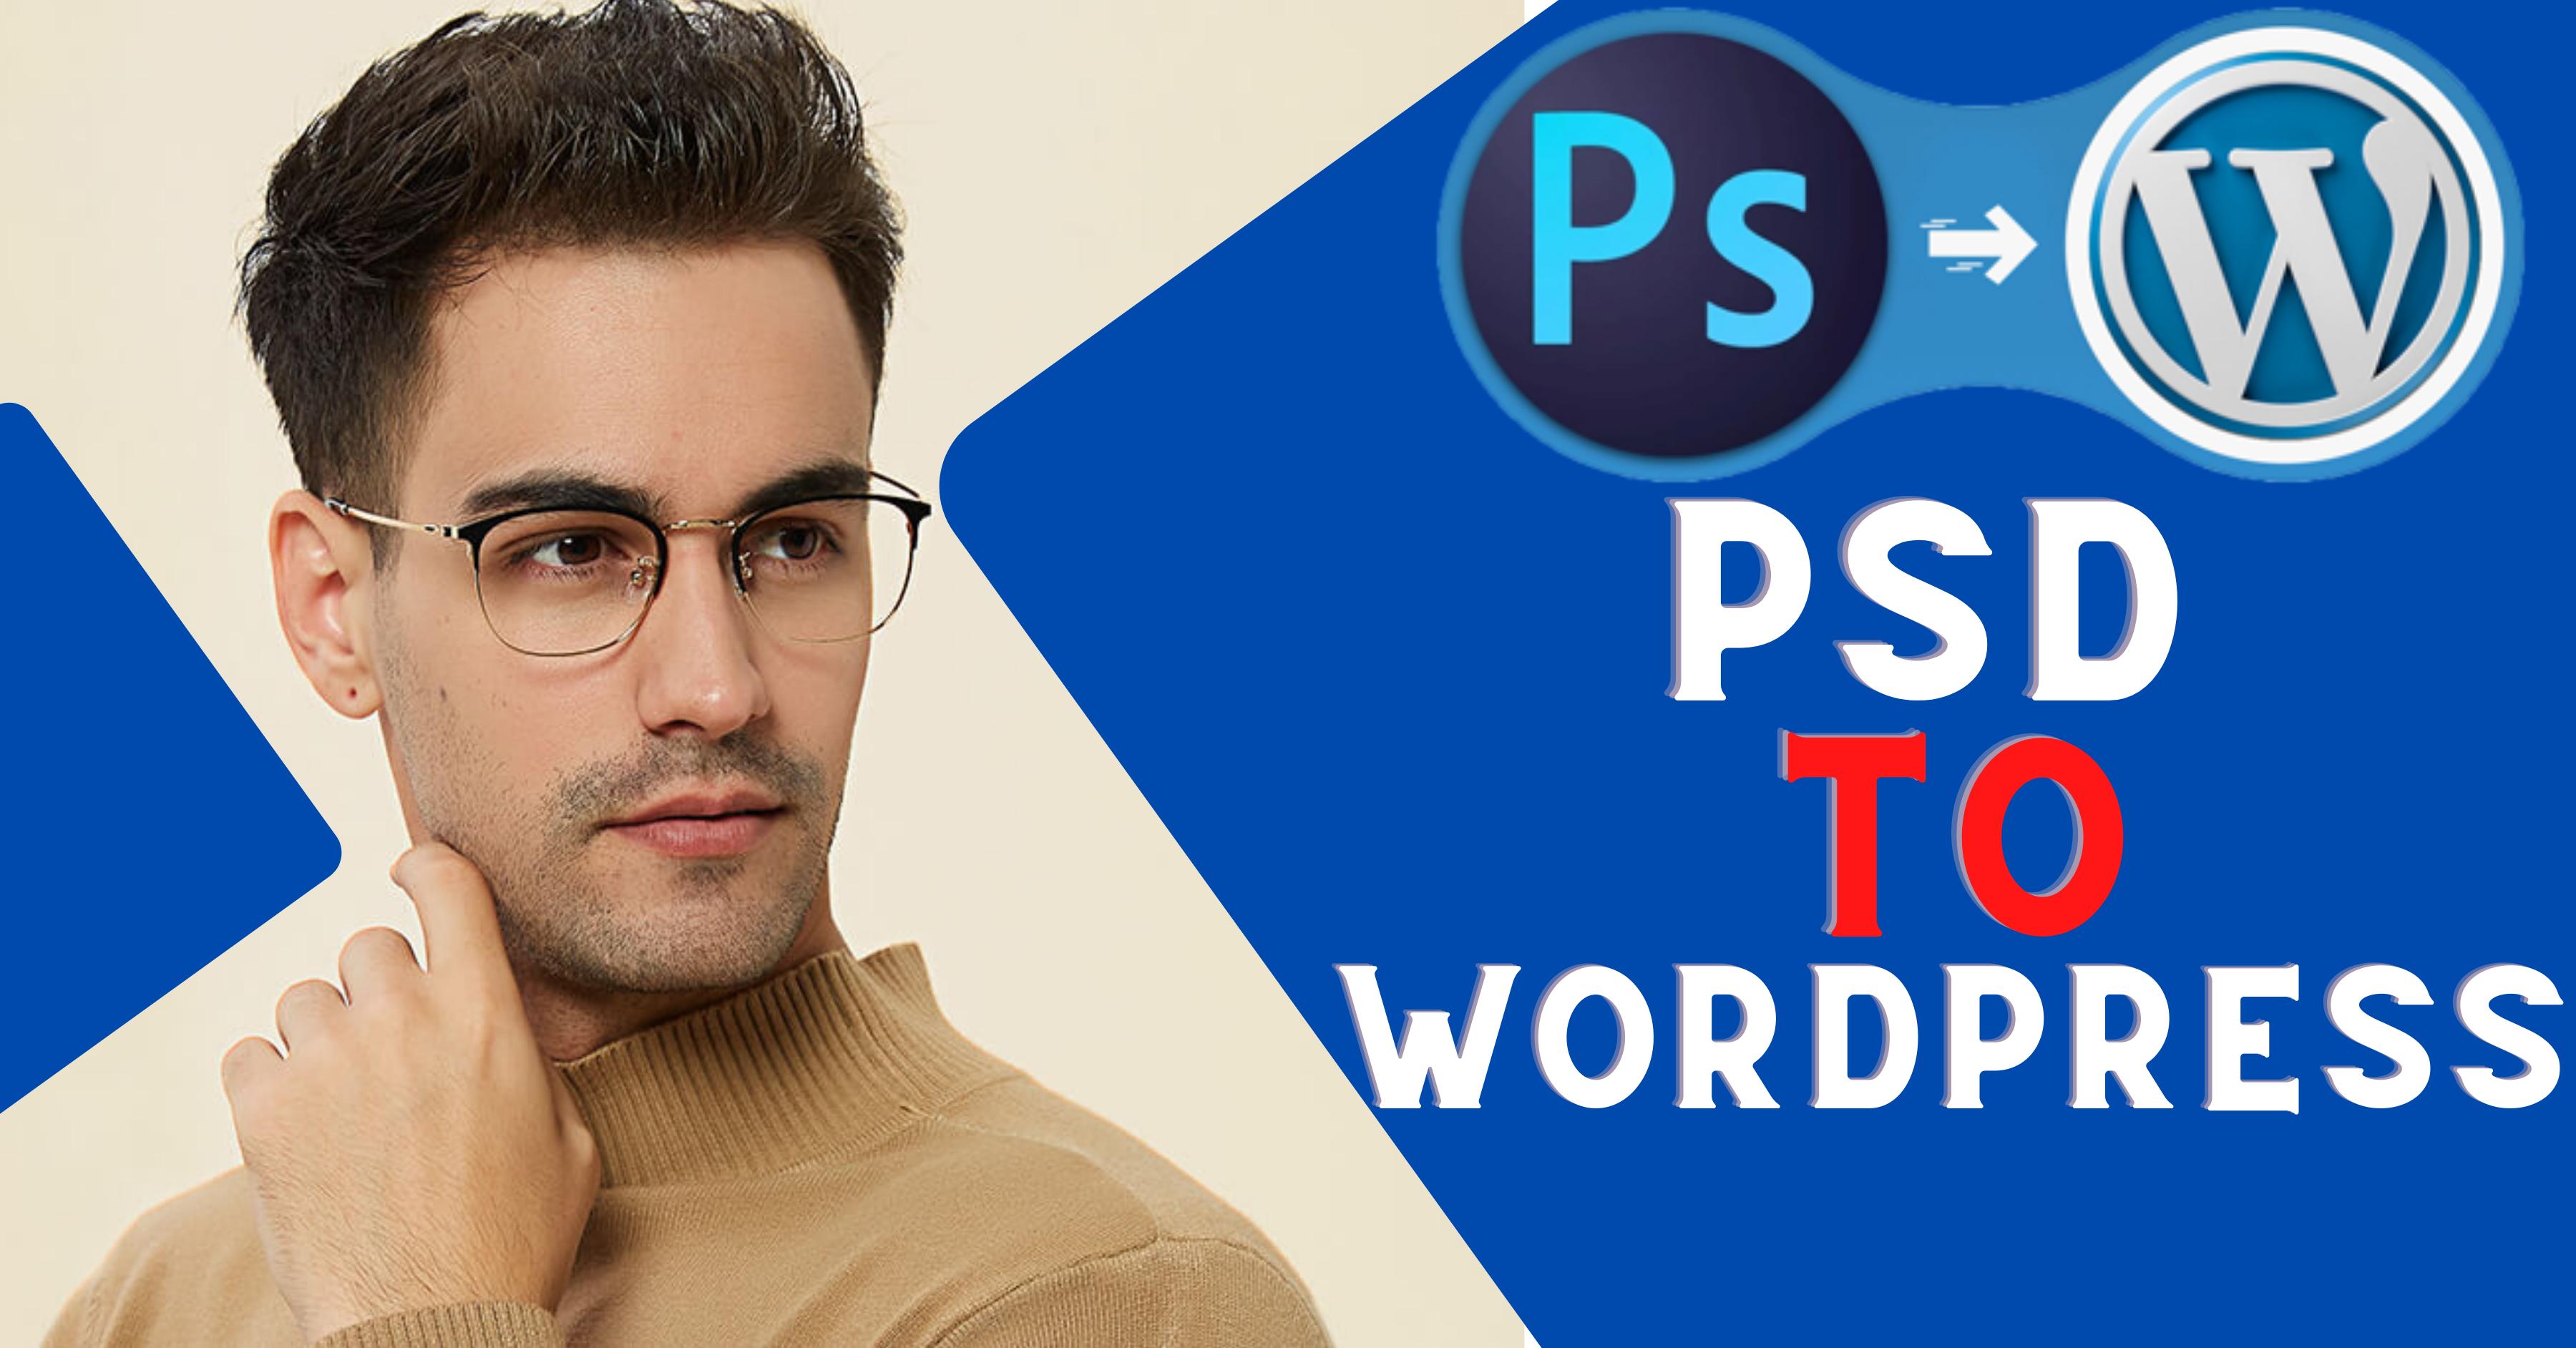 I will convert PSD to responsive Wordpress website